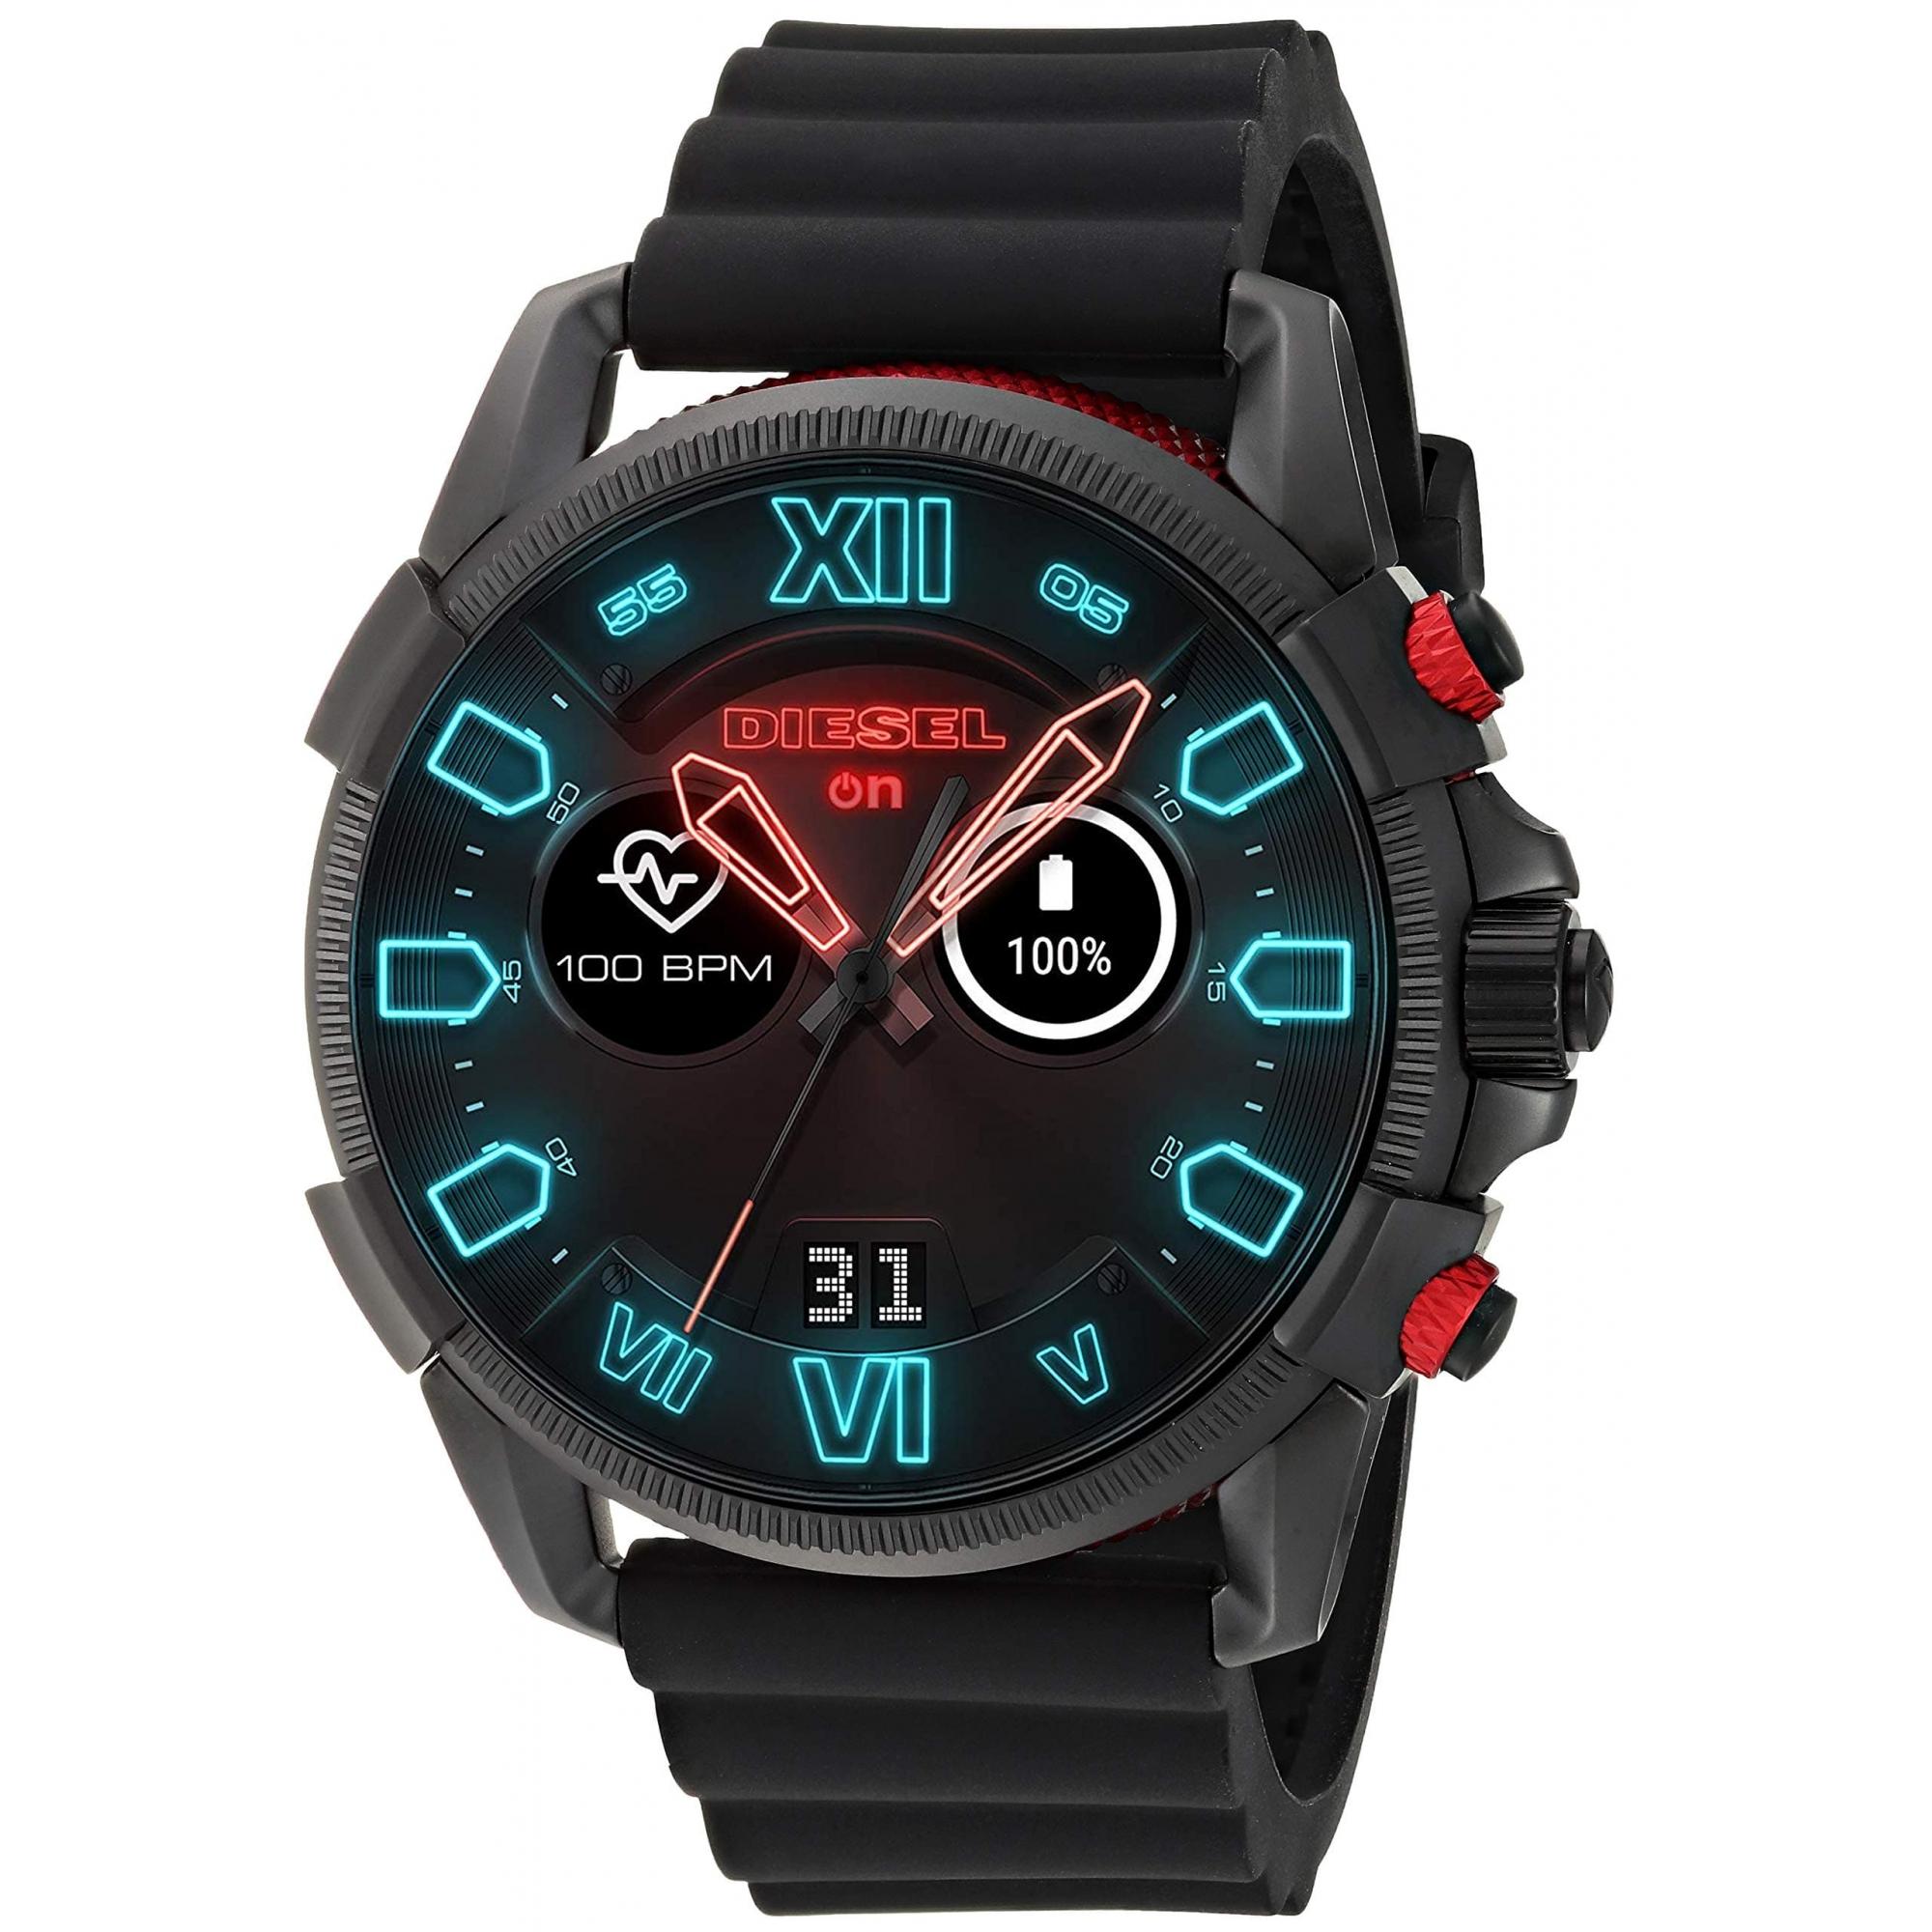 Relógio Smartwatch Diesel Masculino - On Full Guard 2.5 - DZT2010/8PI